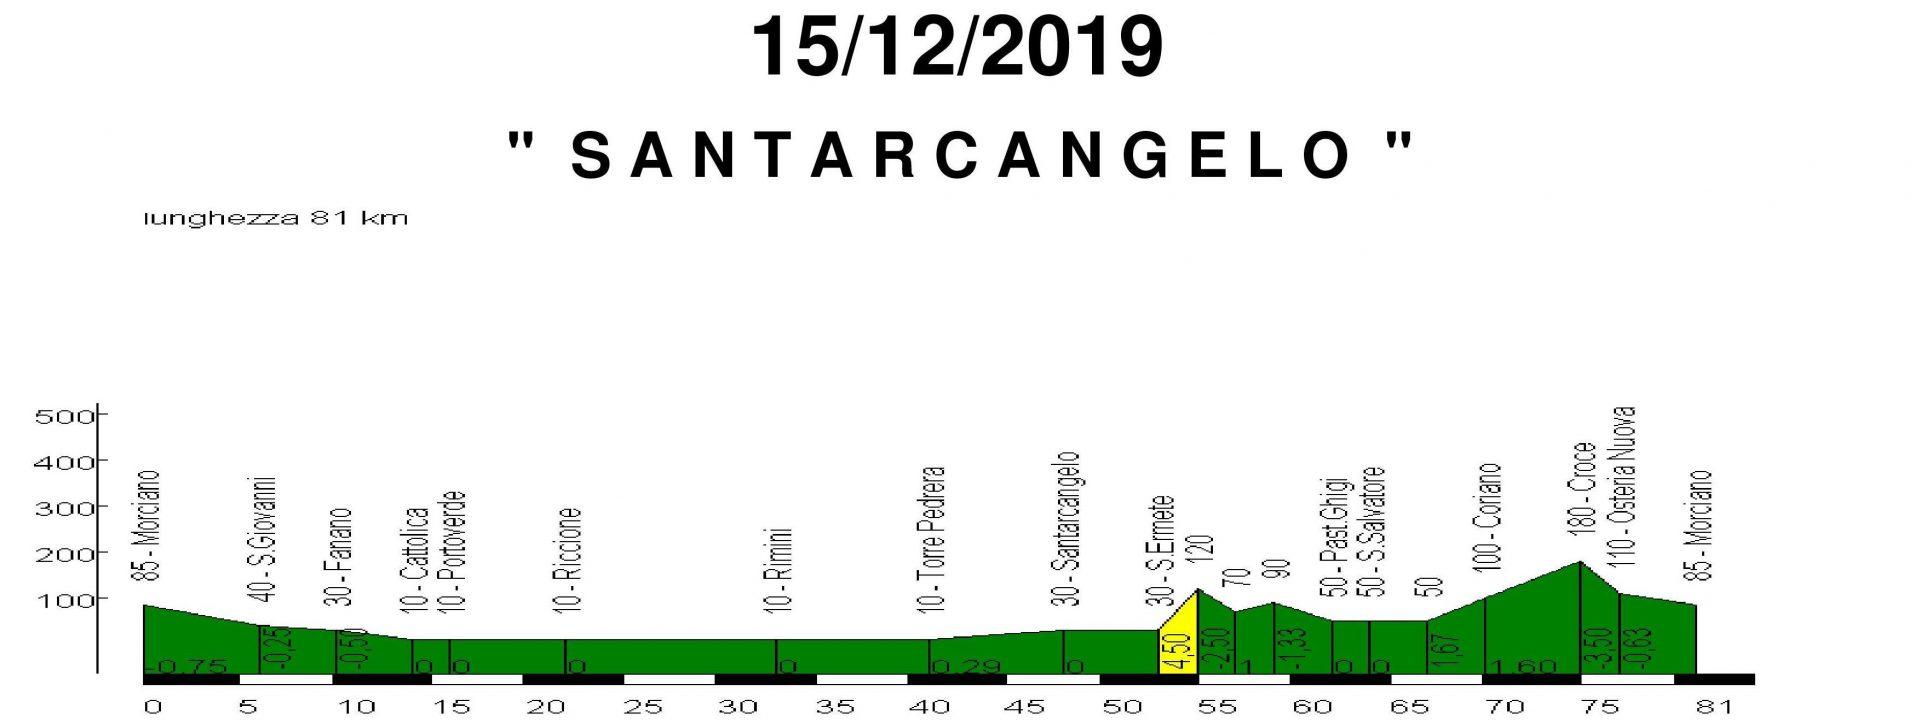 Domenica 15-dic-2019 Santarcangelo